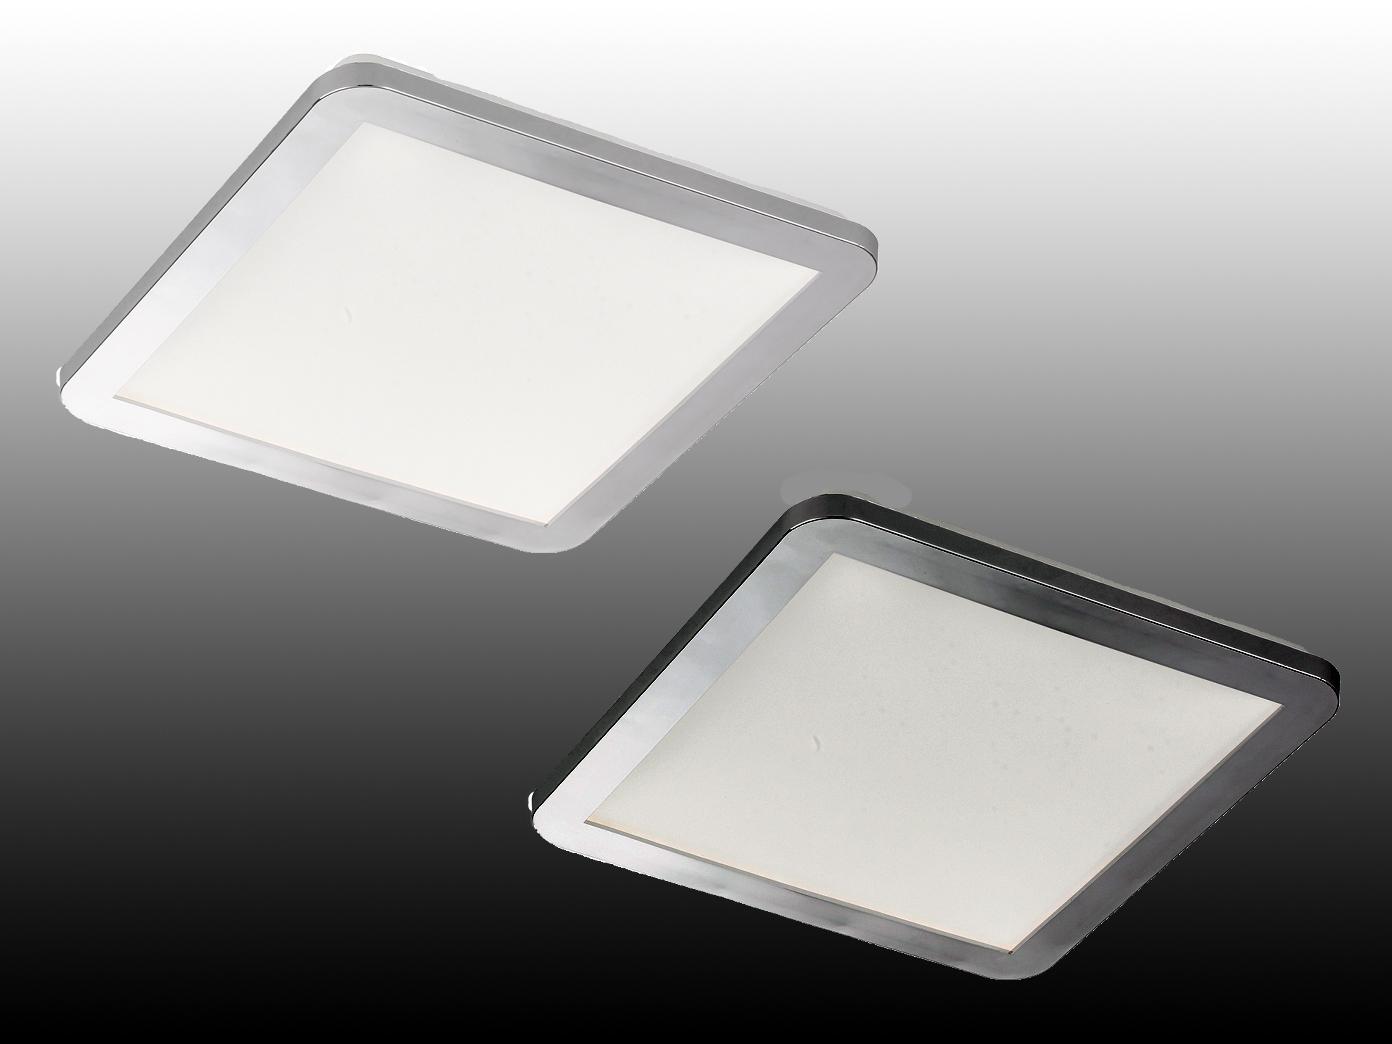 Rechteckige Flache Led Deckenlampen Dimmbare Ip44 Badlampen Im 2er Set Weiß